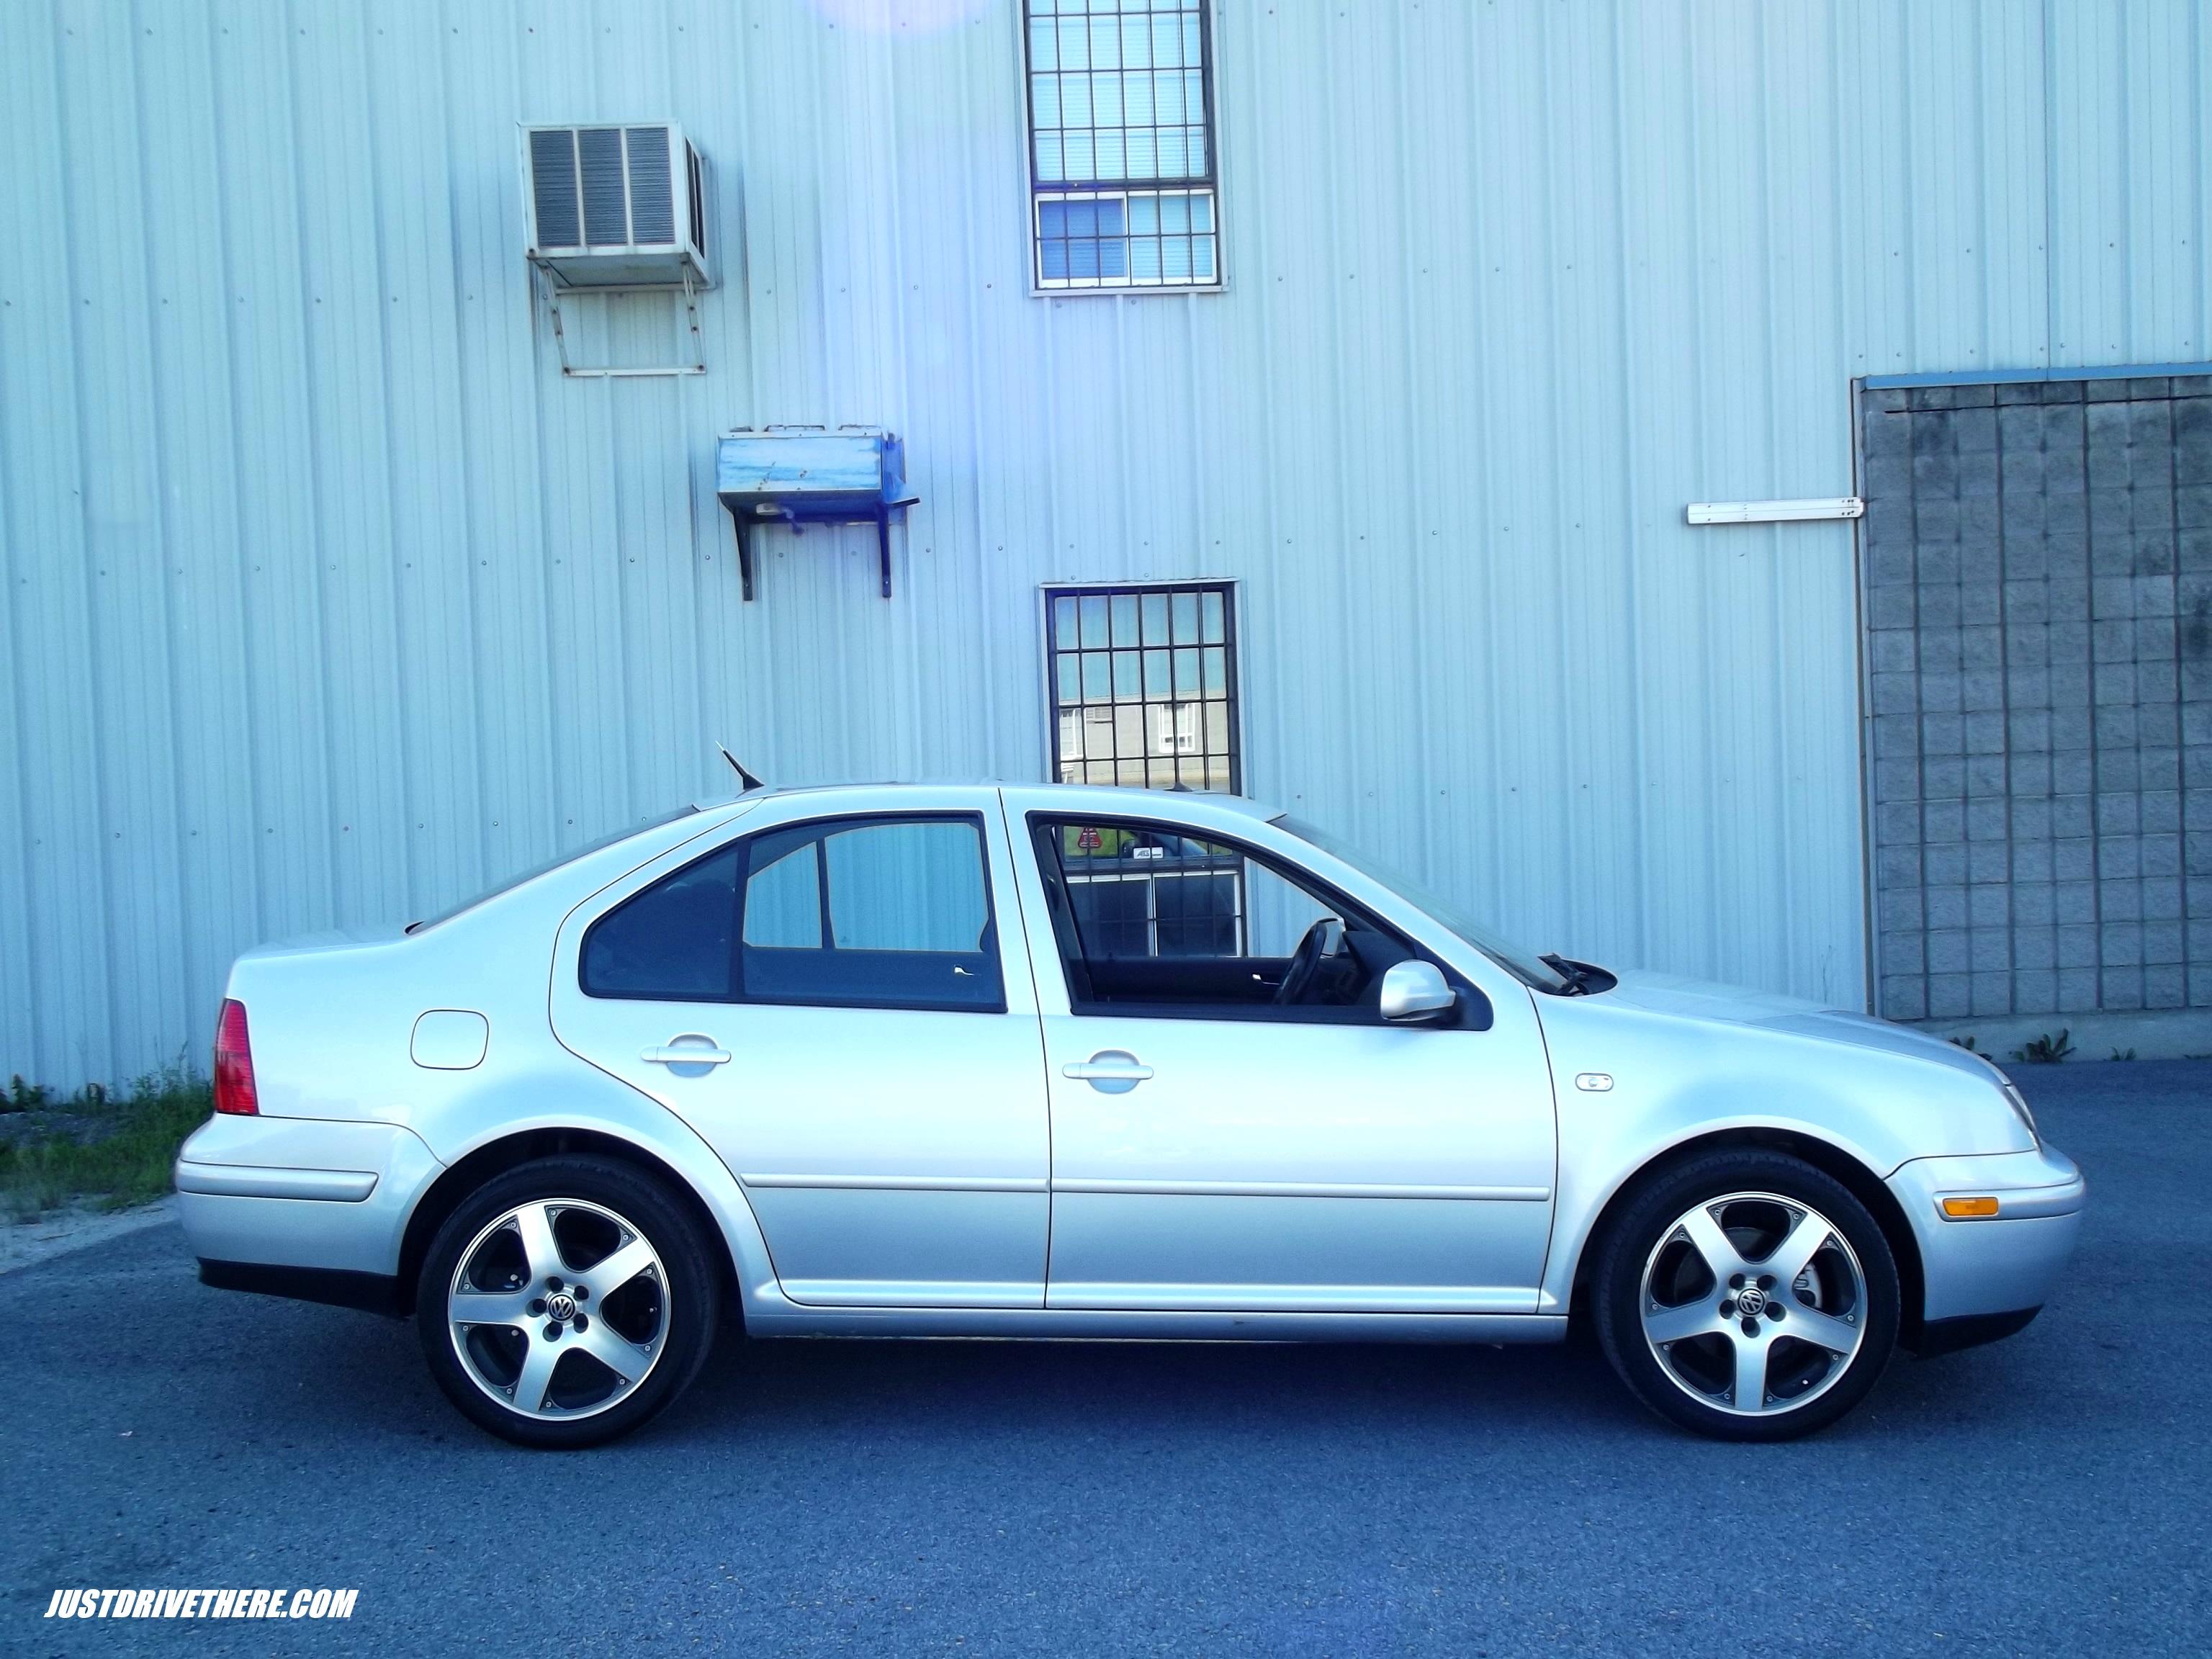 The ideal sleeper 2003 volkswagen jettabora vr6 gli justdrive there 2003 volkswagen jettabora vr6 gli justdrive there publicscrutiny Gallery